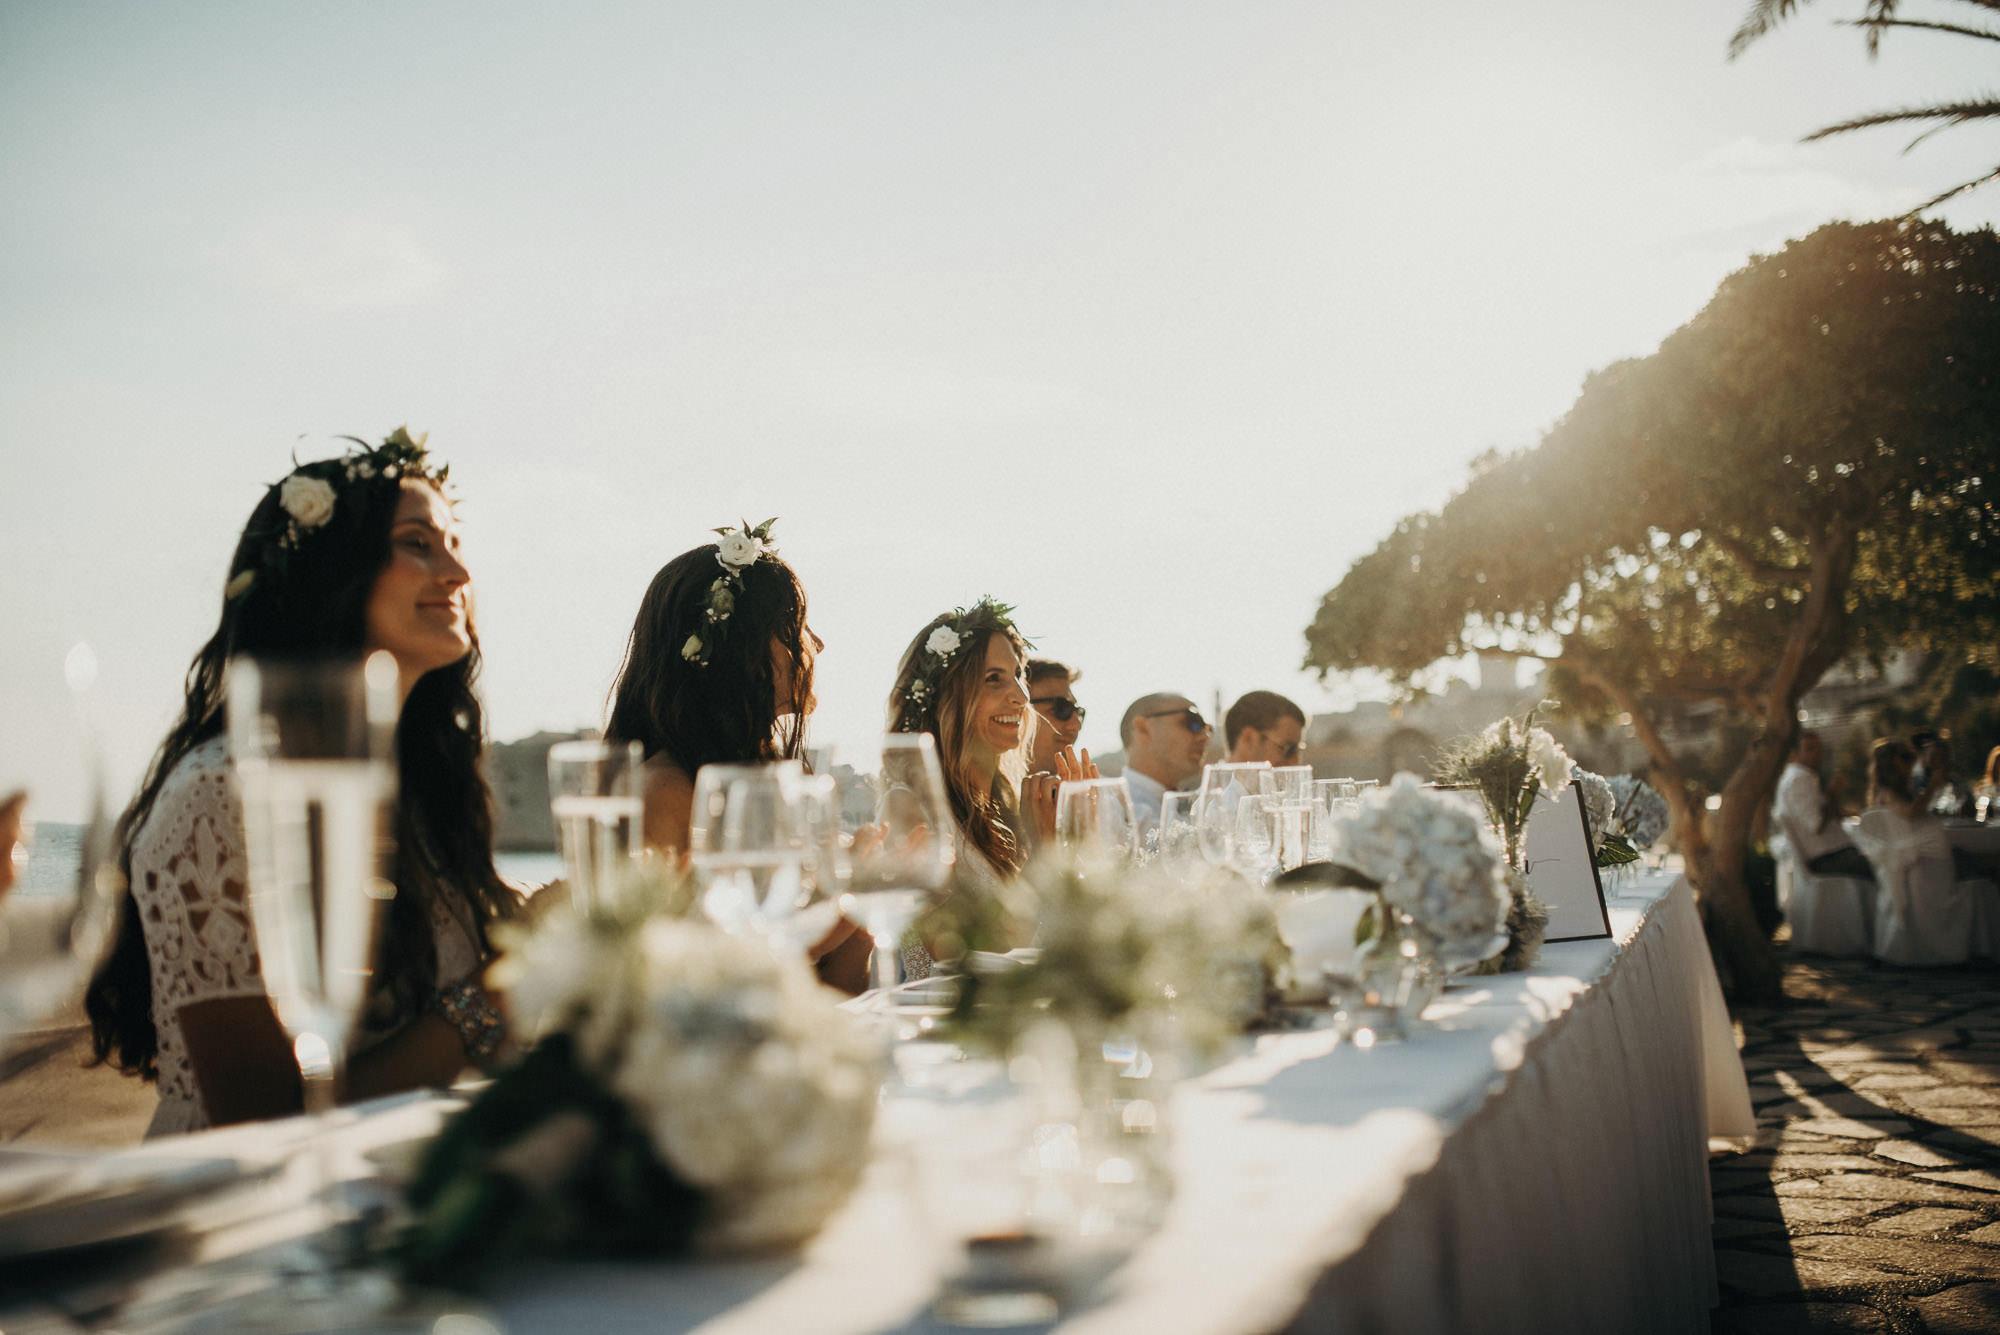 dubrovnik_croatia_wedding_photographer-jere_satamo-destination_weddings-058-web.jpg